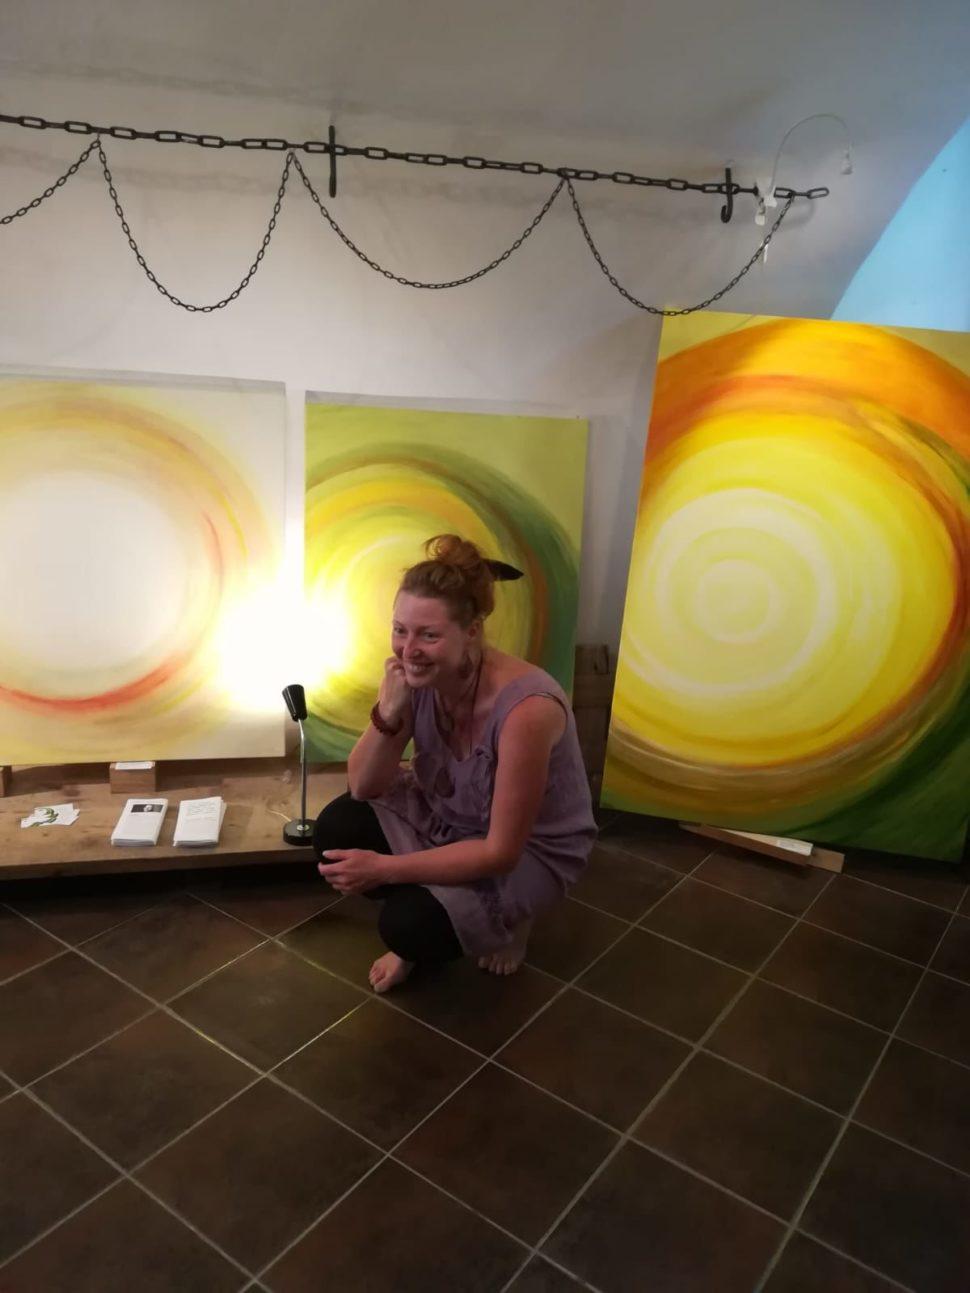 Výstava abstraktních obrazů Jane H. - Galerie Supice, Tábor - autorka sobrazy